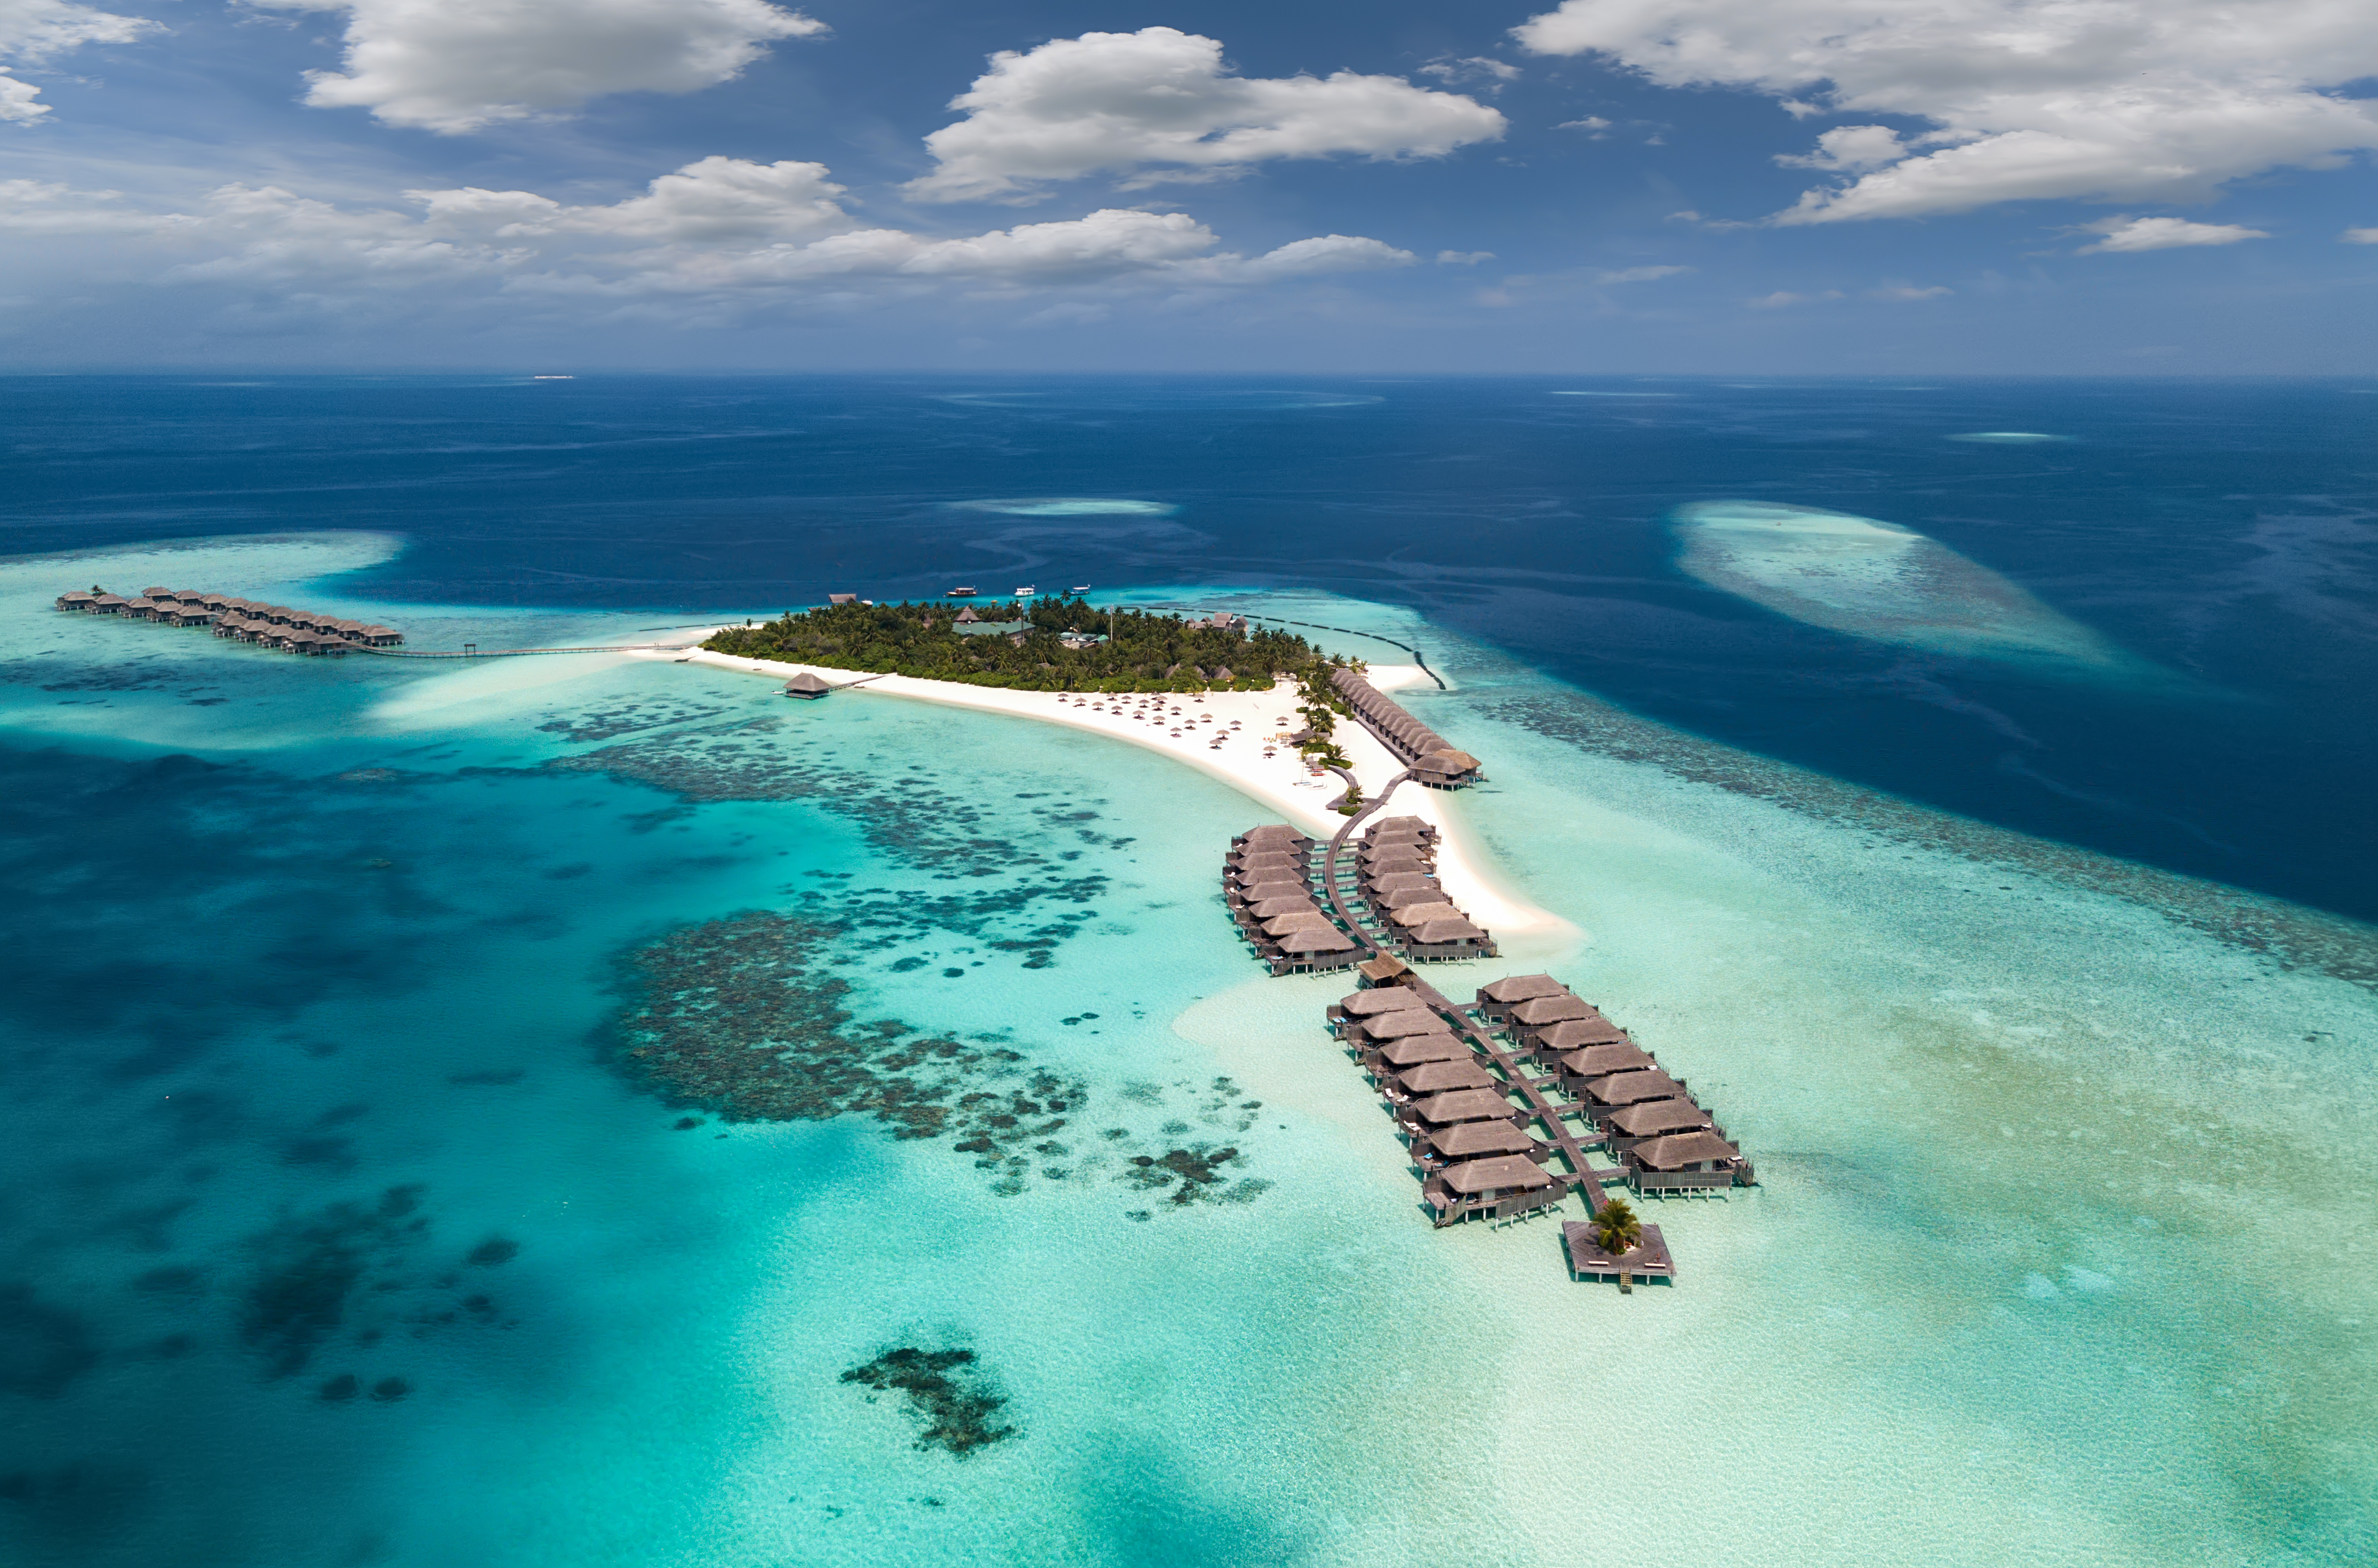 Aerial view of maldives island.jpg